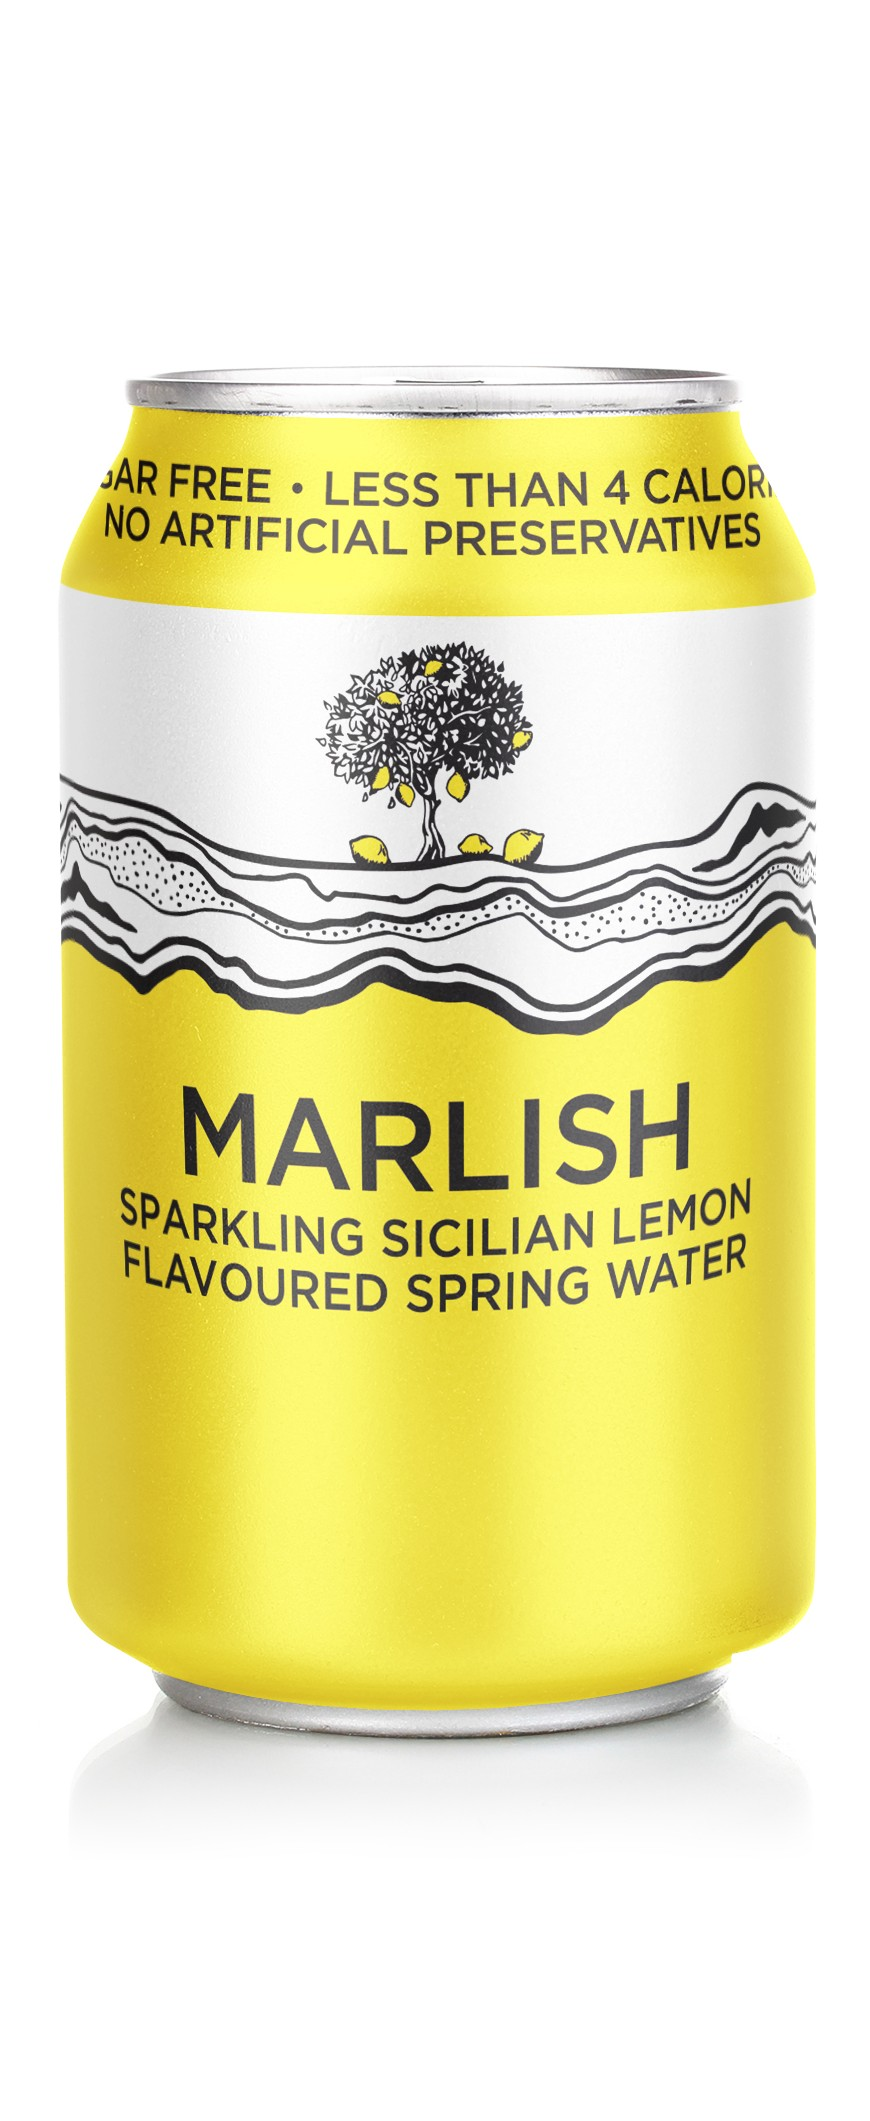 Sparkling Sicilian Lemon